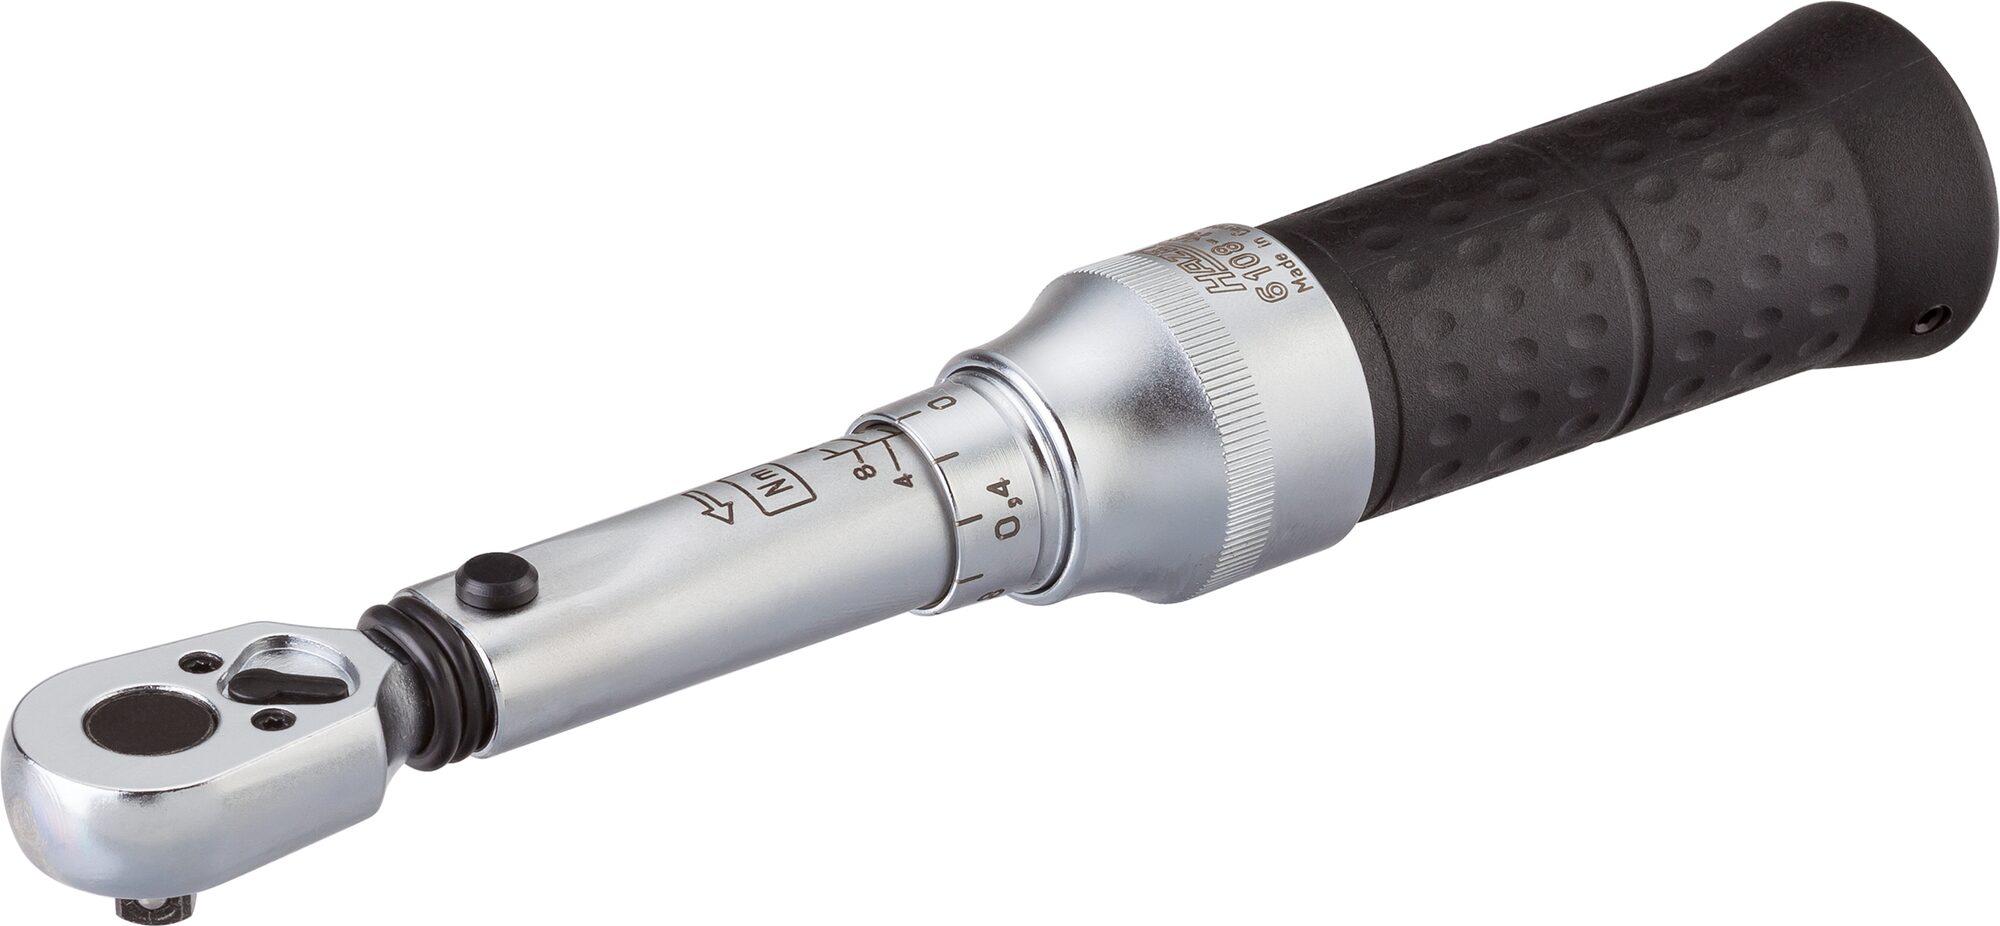 HAZET Drehmoment-Schlüssel 6108-1CT ∙ Nm min-max: 2–10 Nm ∙ Toleranz: 2% ∙ Vierkant massiv 6,3 mm (1/4 Zoll)